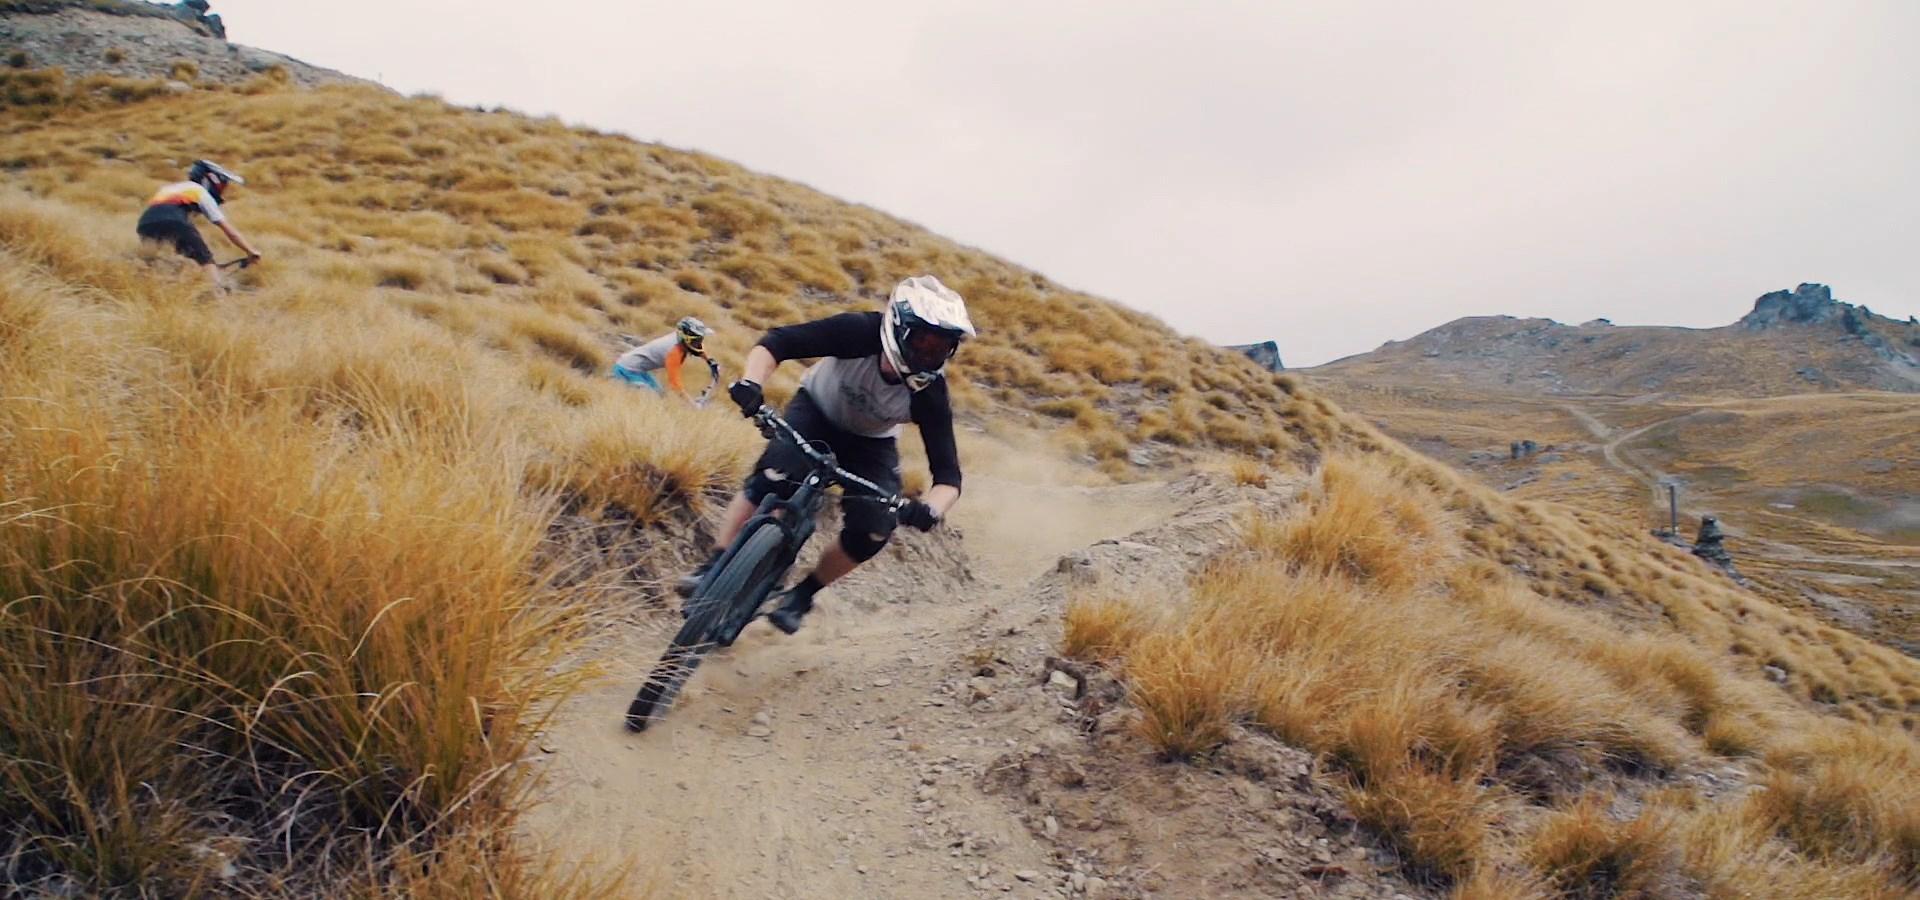 0304c68f217 Mountain Biking in NZ's Highest Bike Park   Cardrona NZ